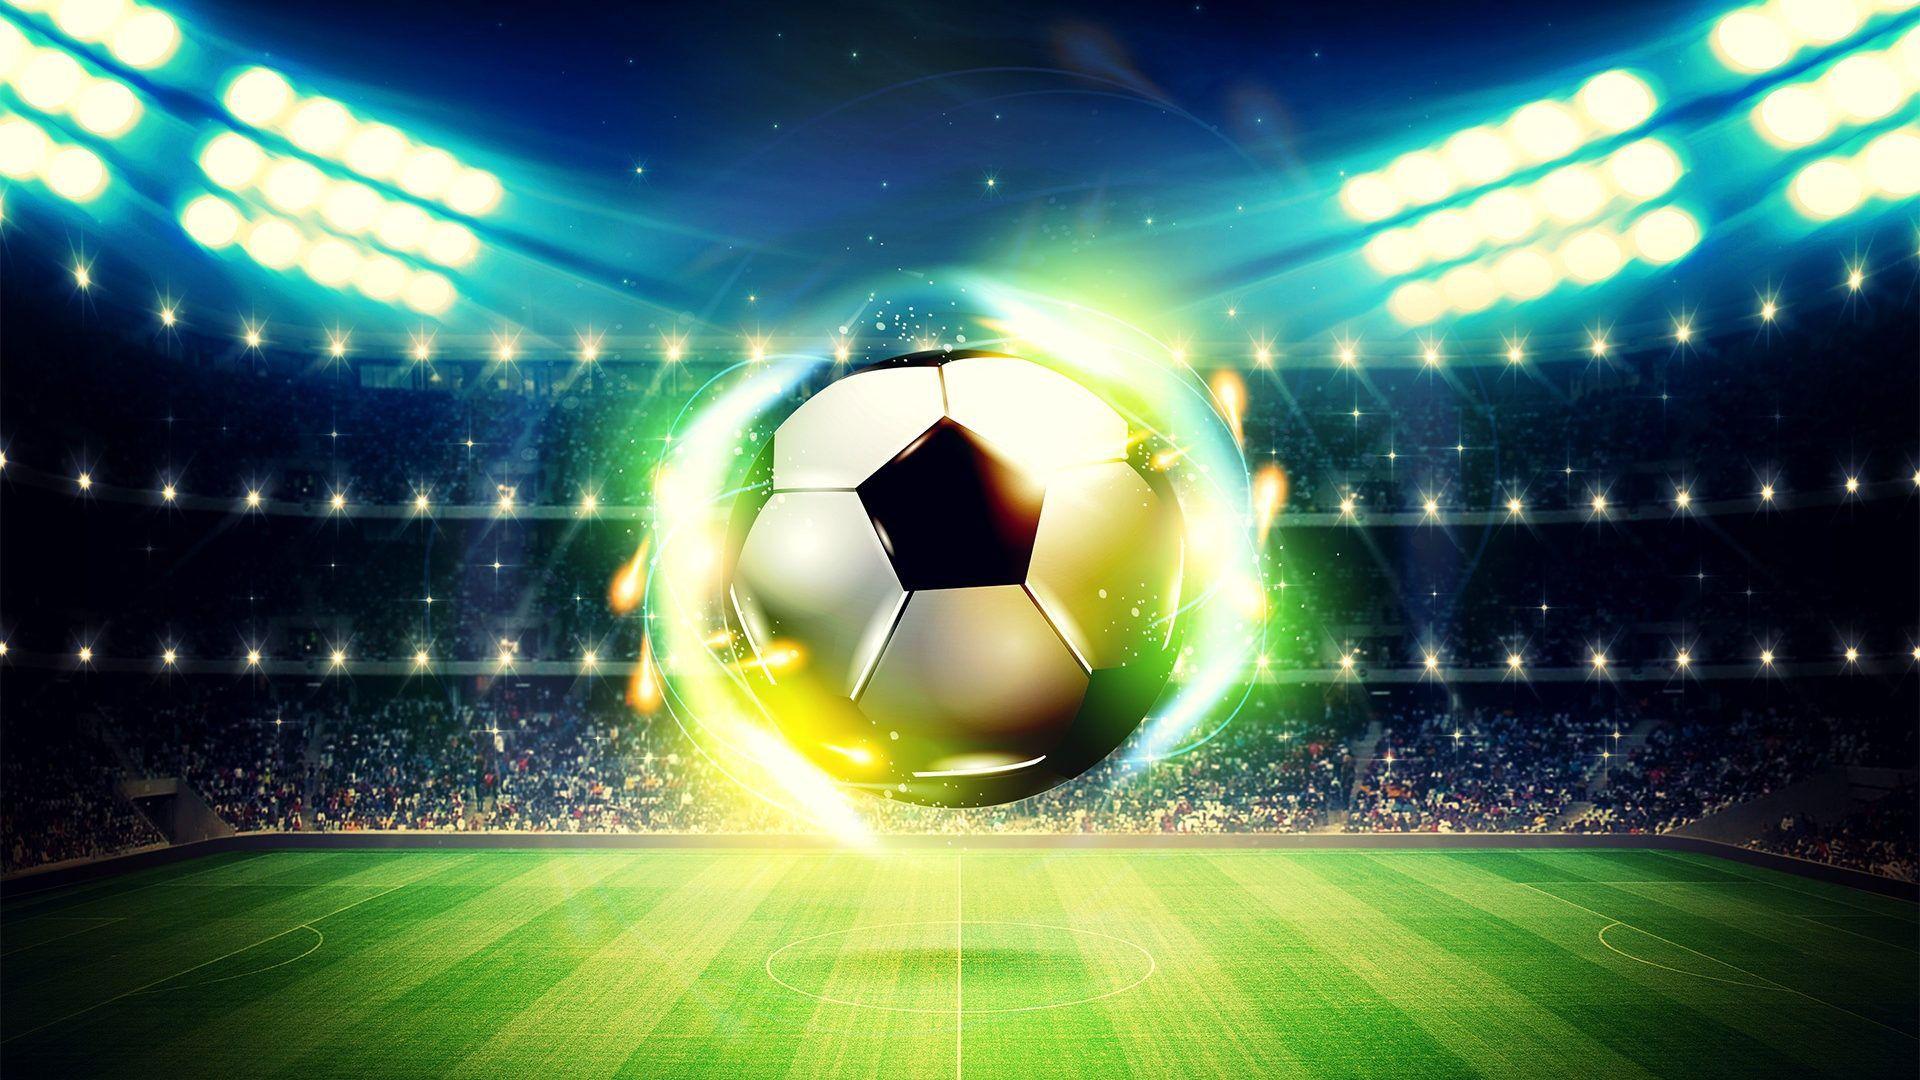 hd pics photos stunning attractive football 17 hd desktop background  wallpaper | Leicester city, Swansea city, Stoke city